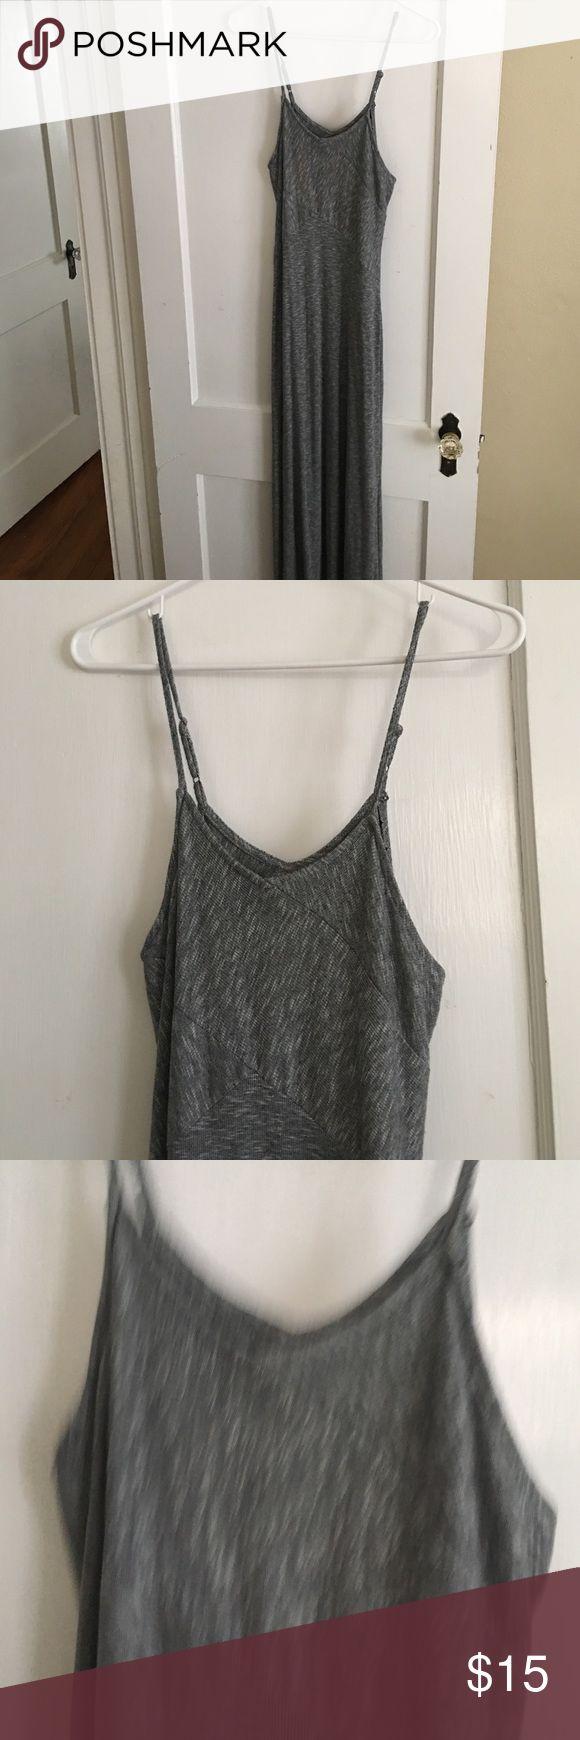 V neck grey maxi dress V neck adjustable strap grey maxi dress. Worn once. Mossimo Supply Co Dresses Maxi